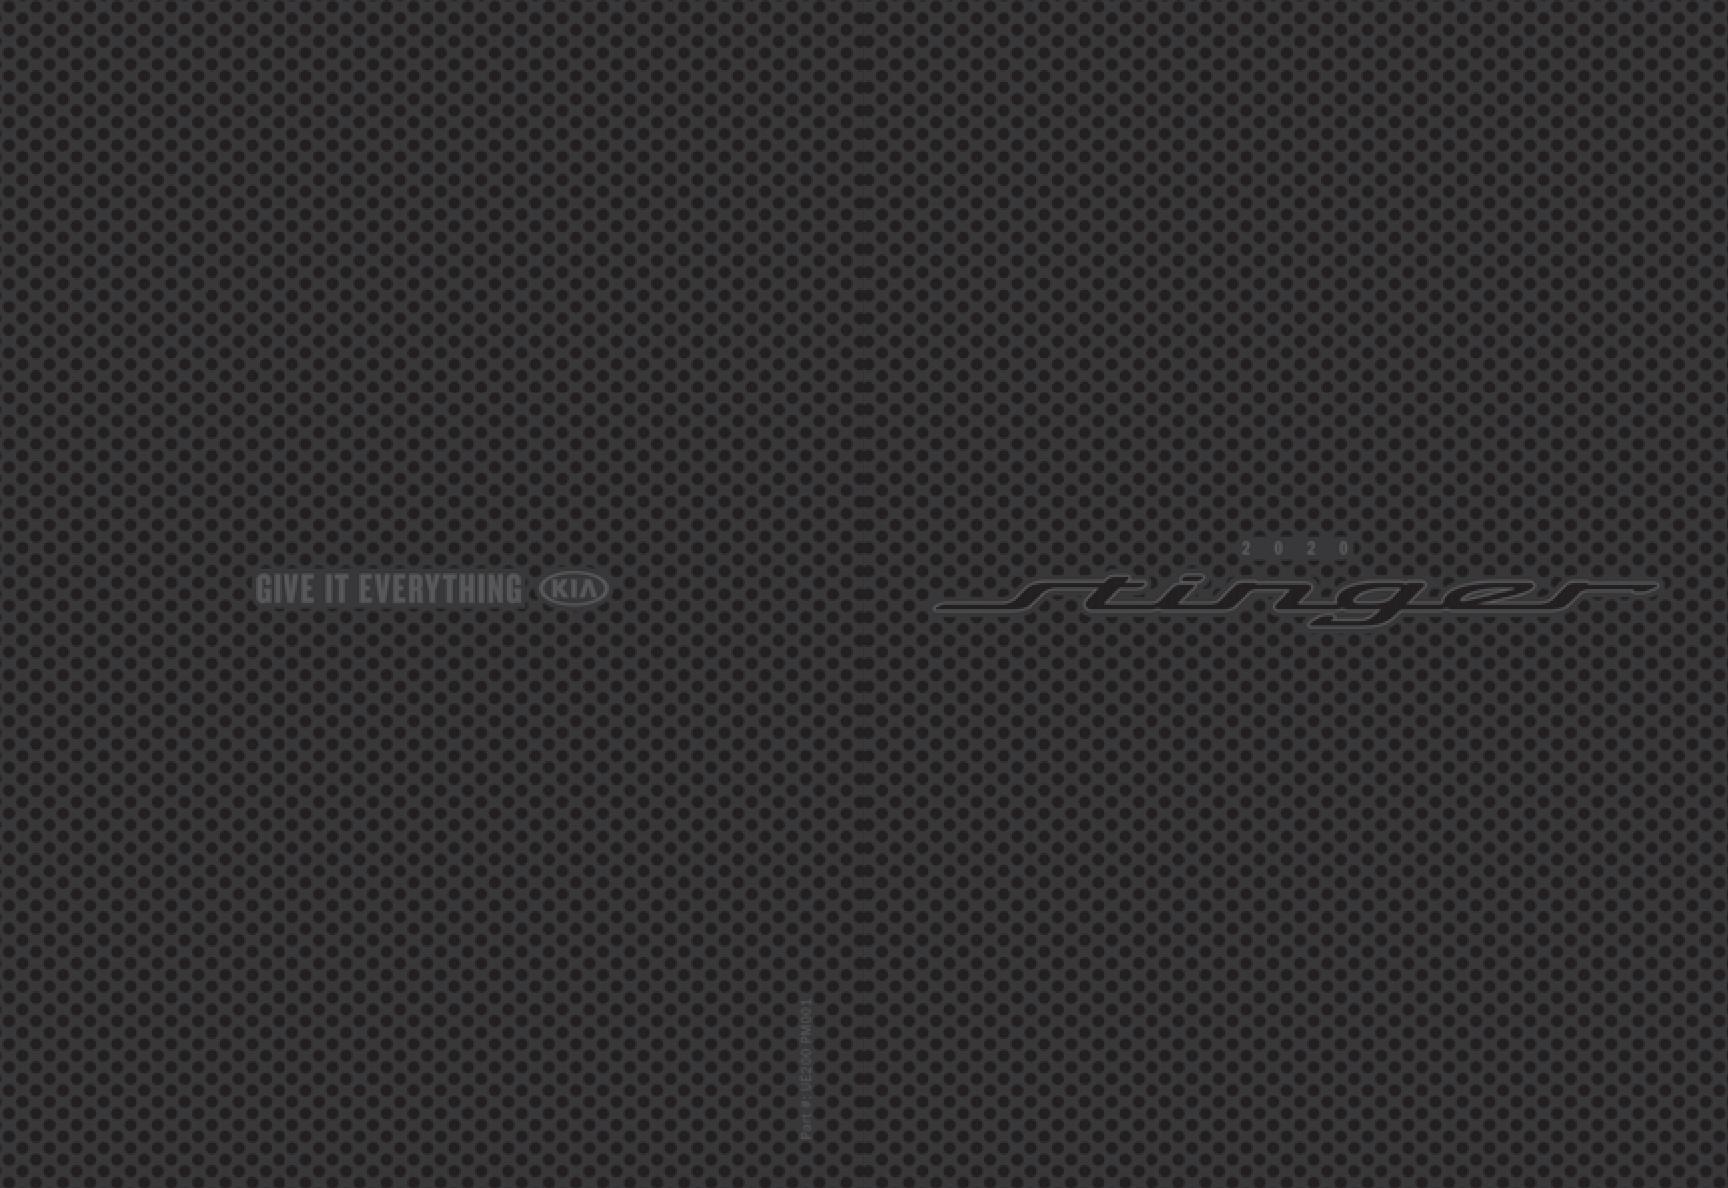 2021-2020 Stinger Brochure.pdf | PDF Host